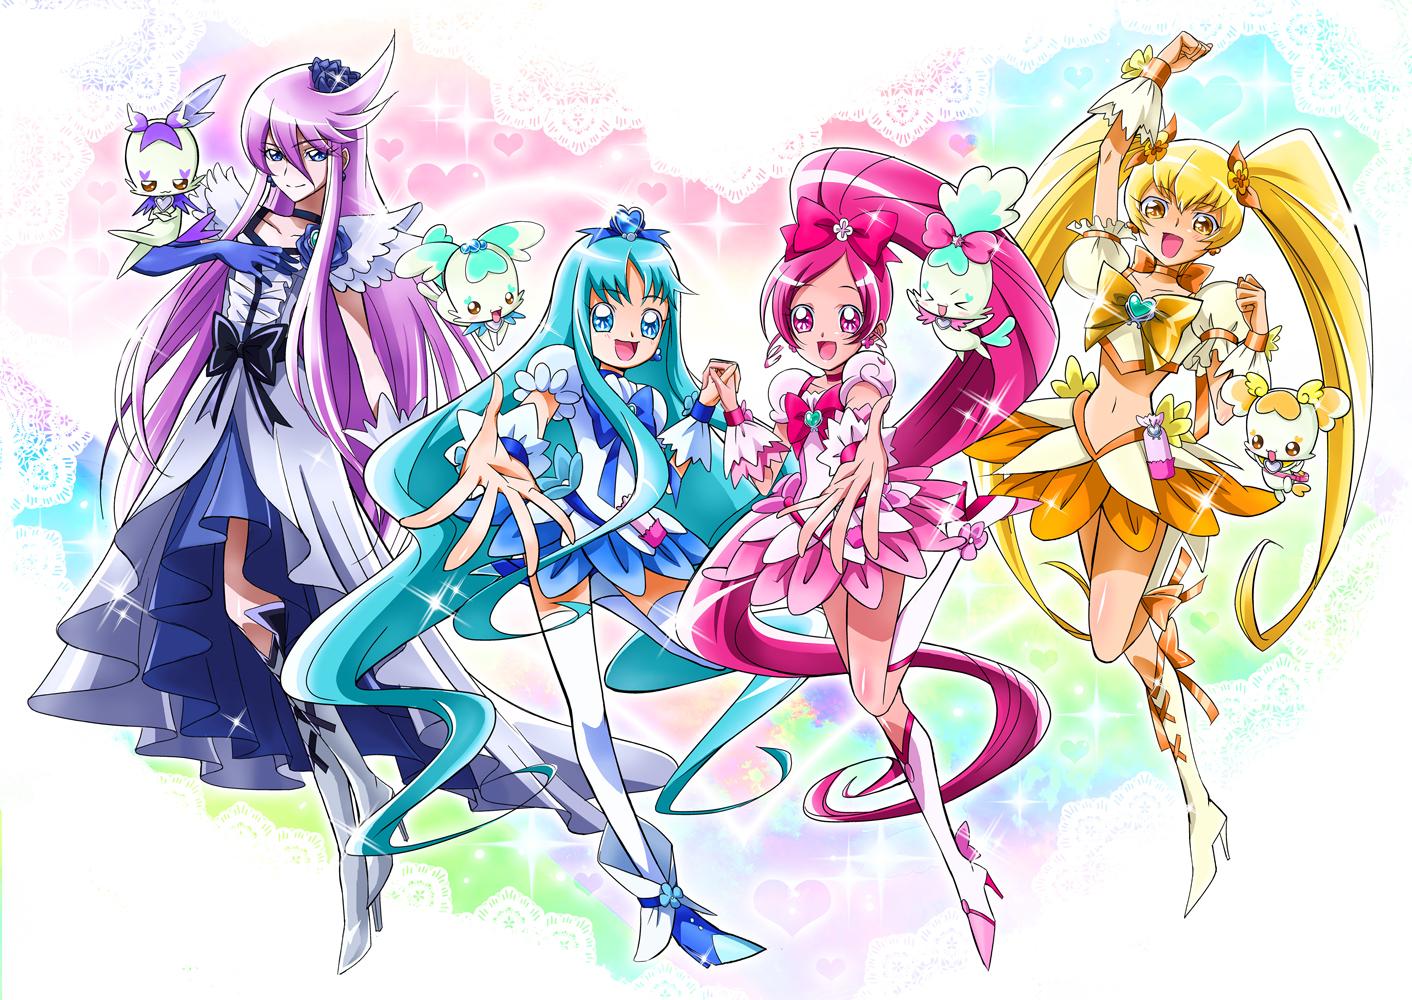 Hanasaki Mitsuba  New Generation Pretty cure! Wiki